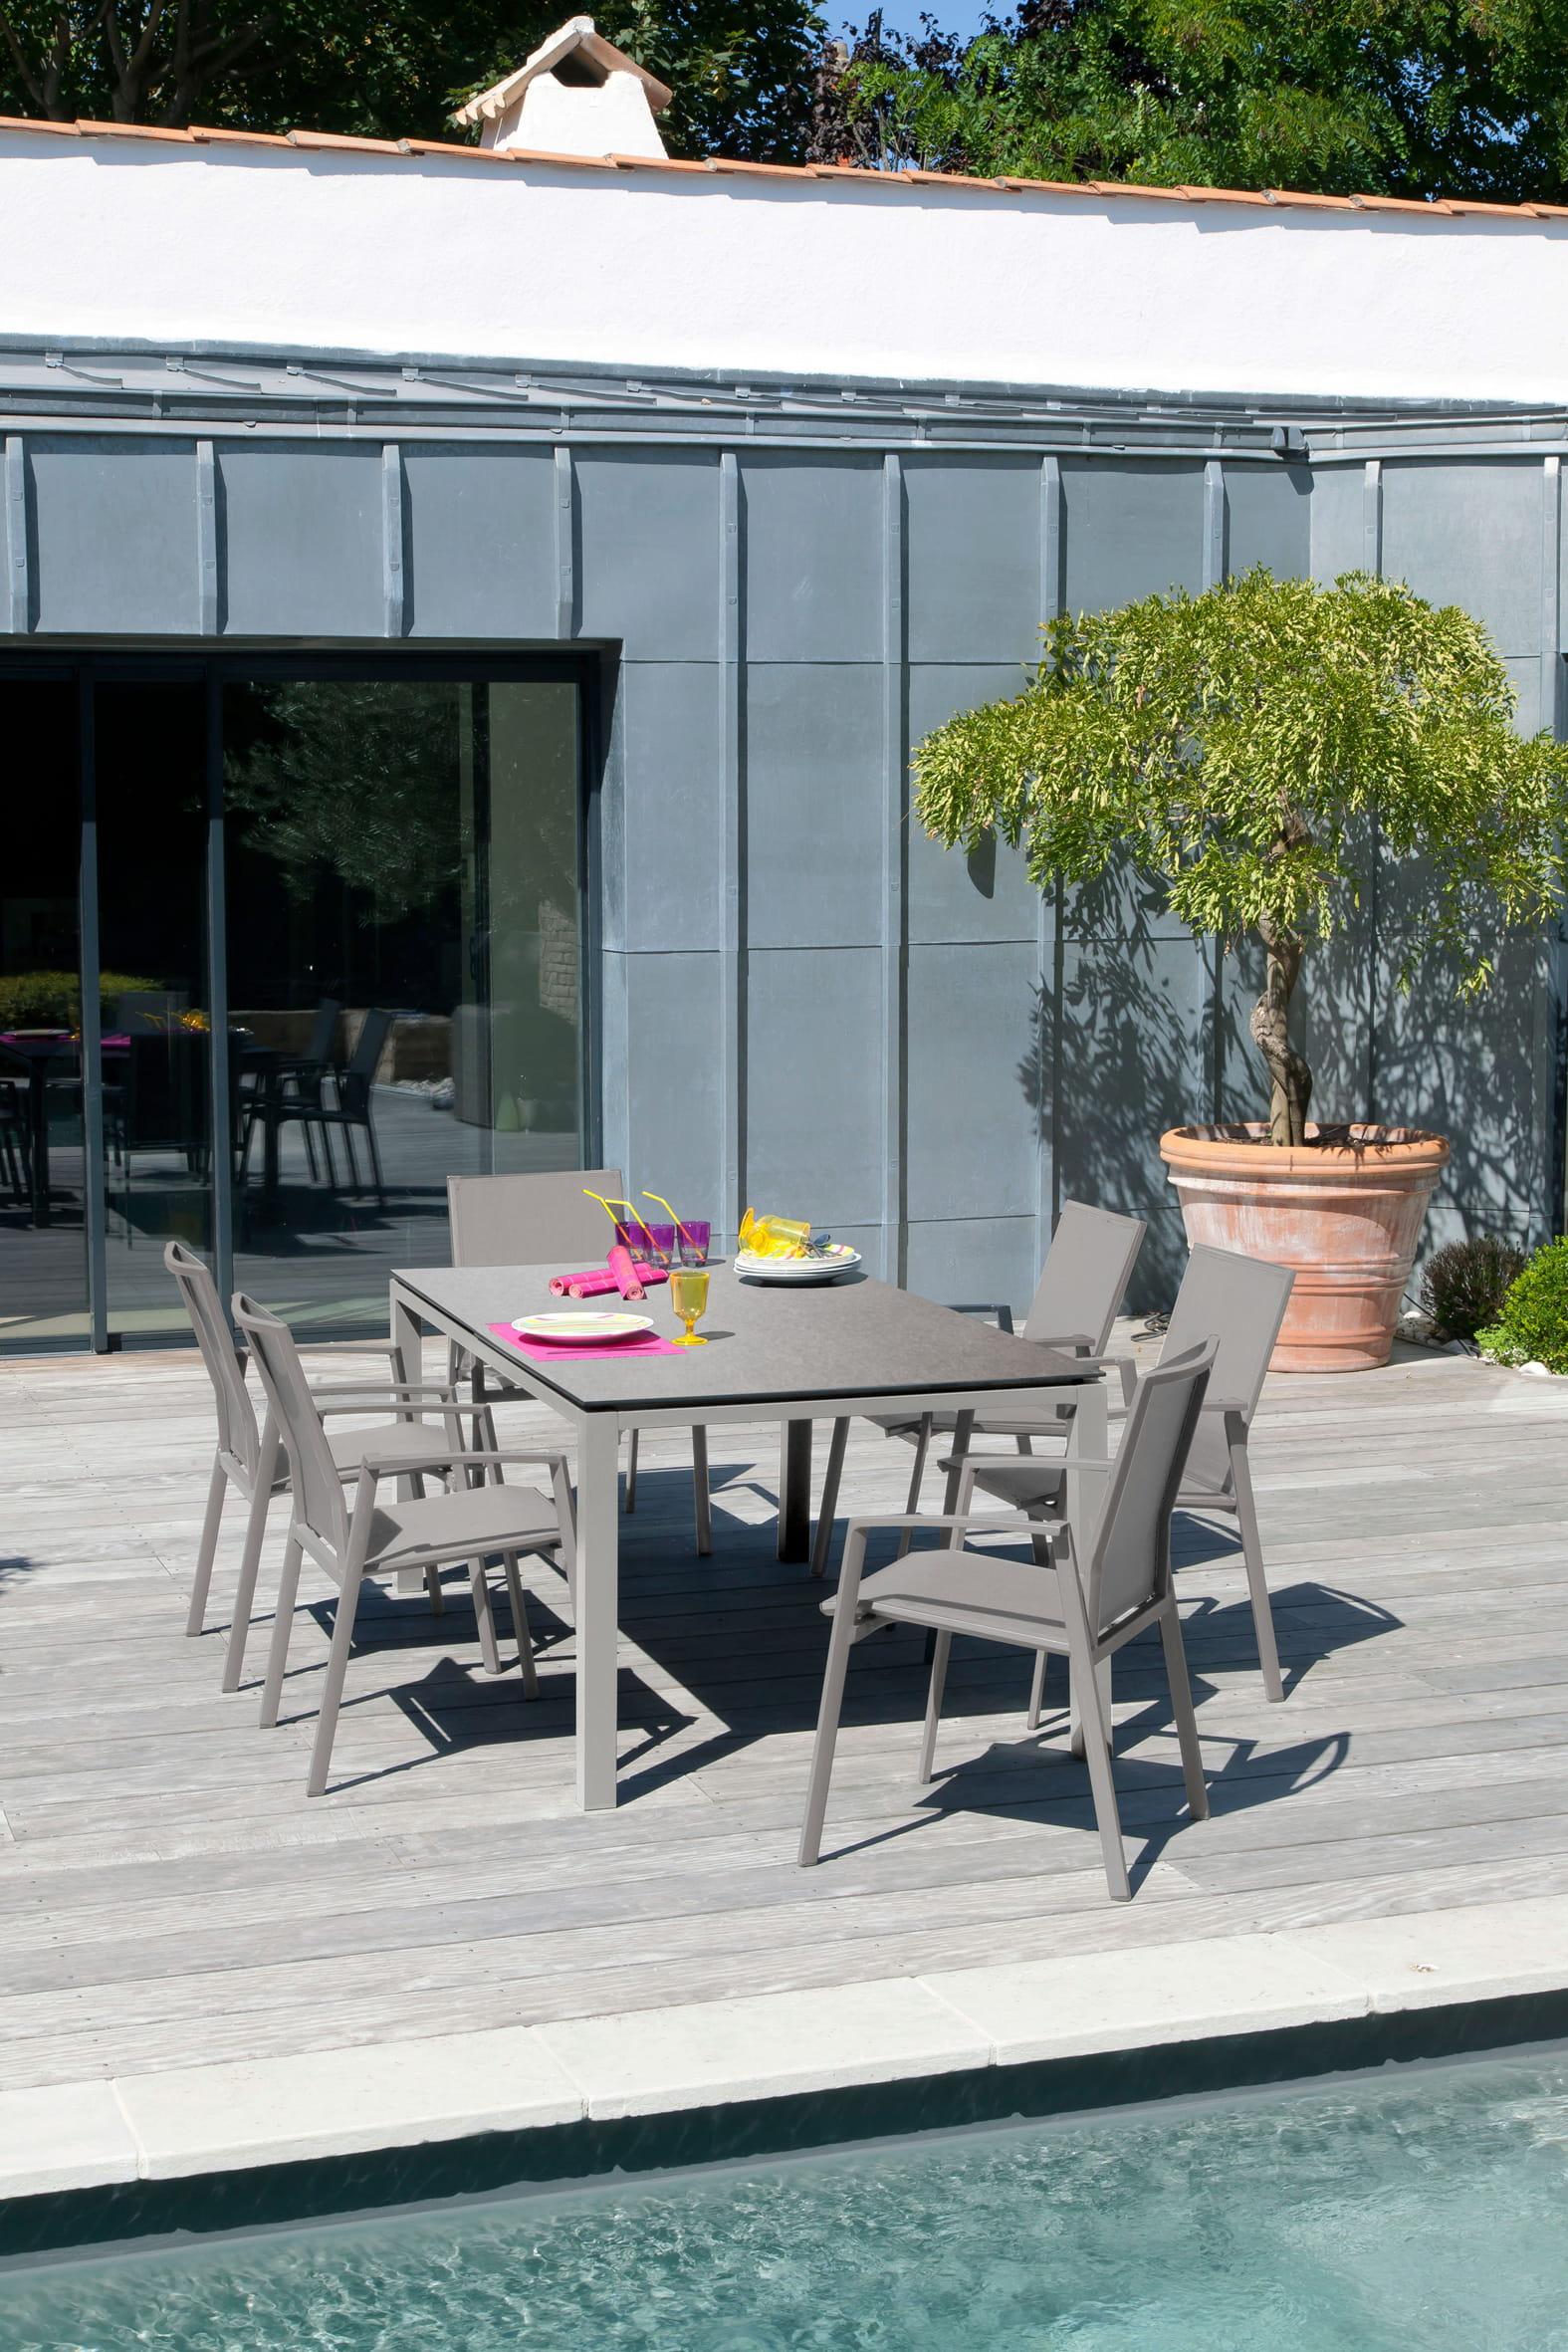 Salon de jardin stoneo chez proloisirs salon de jardin 20 ensembles outdoor en bois - Salon de jardin bois taupe ...